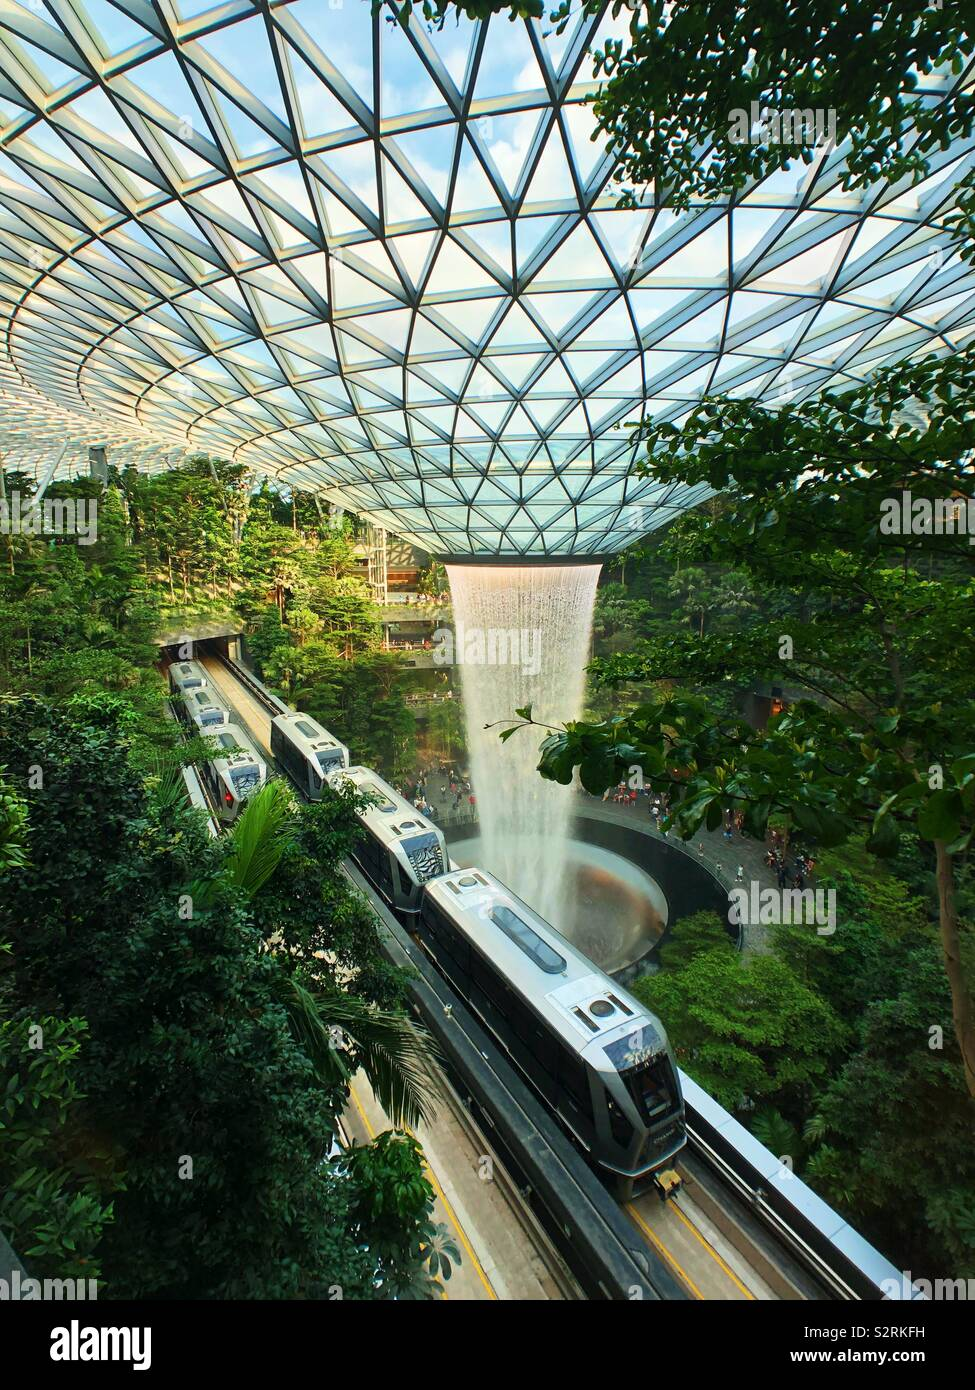 Joya, el aeropuerto de Singapur. Foto de stock